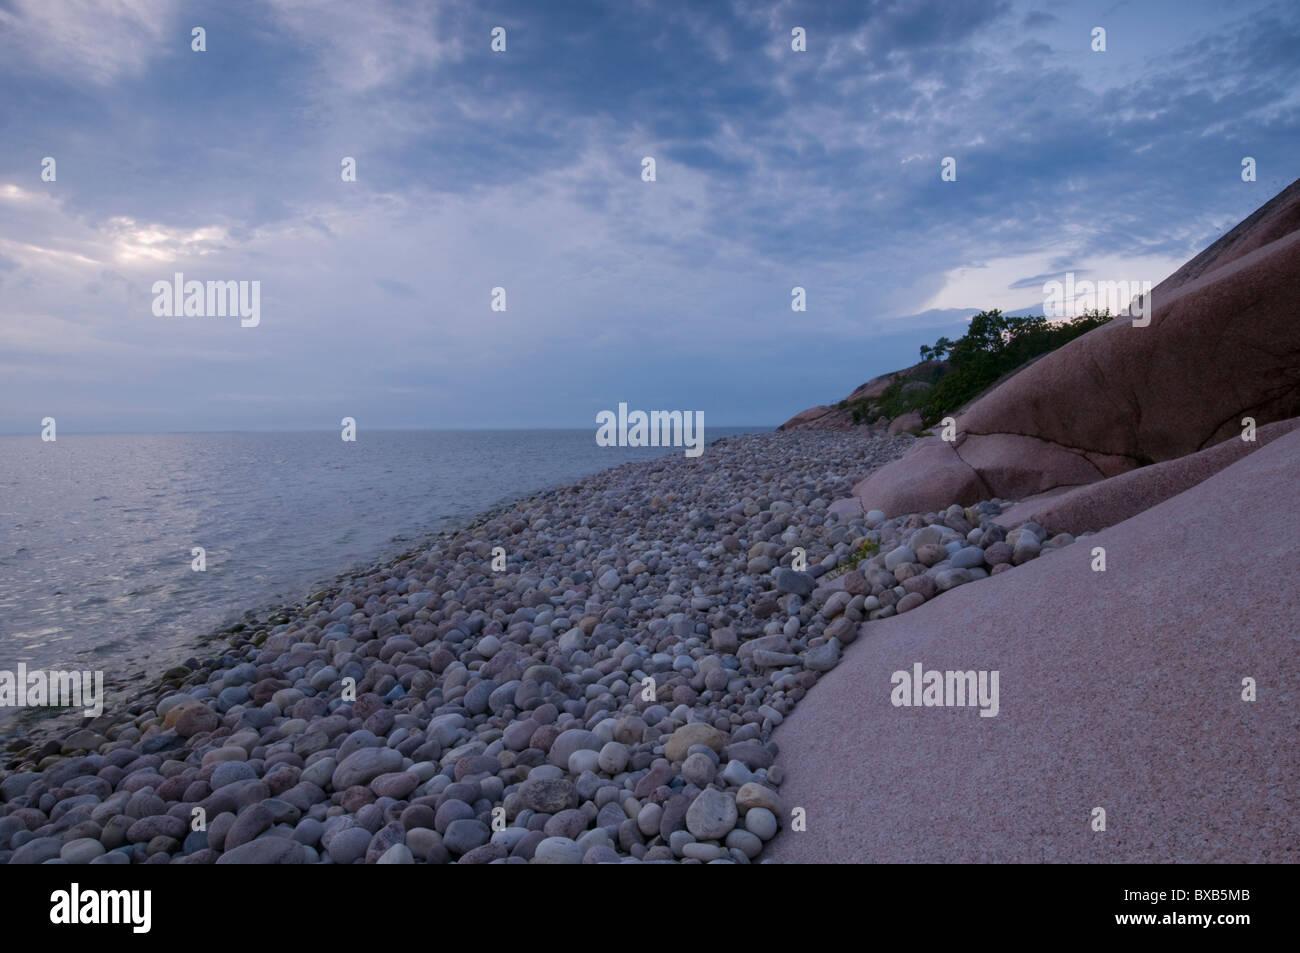 Pebbles on shore - Stock Image